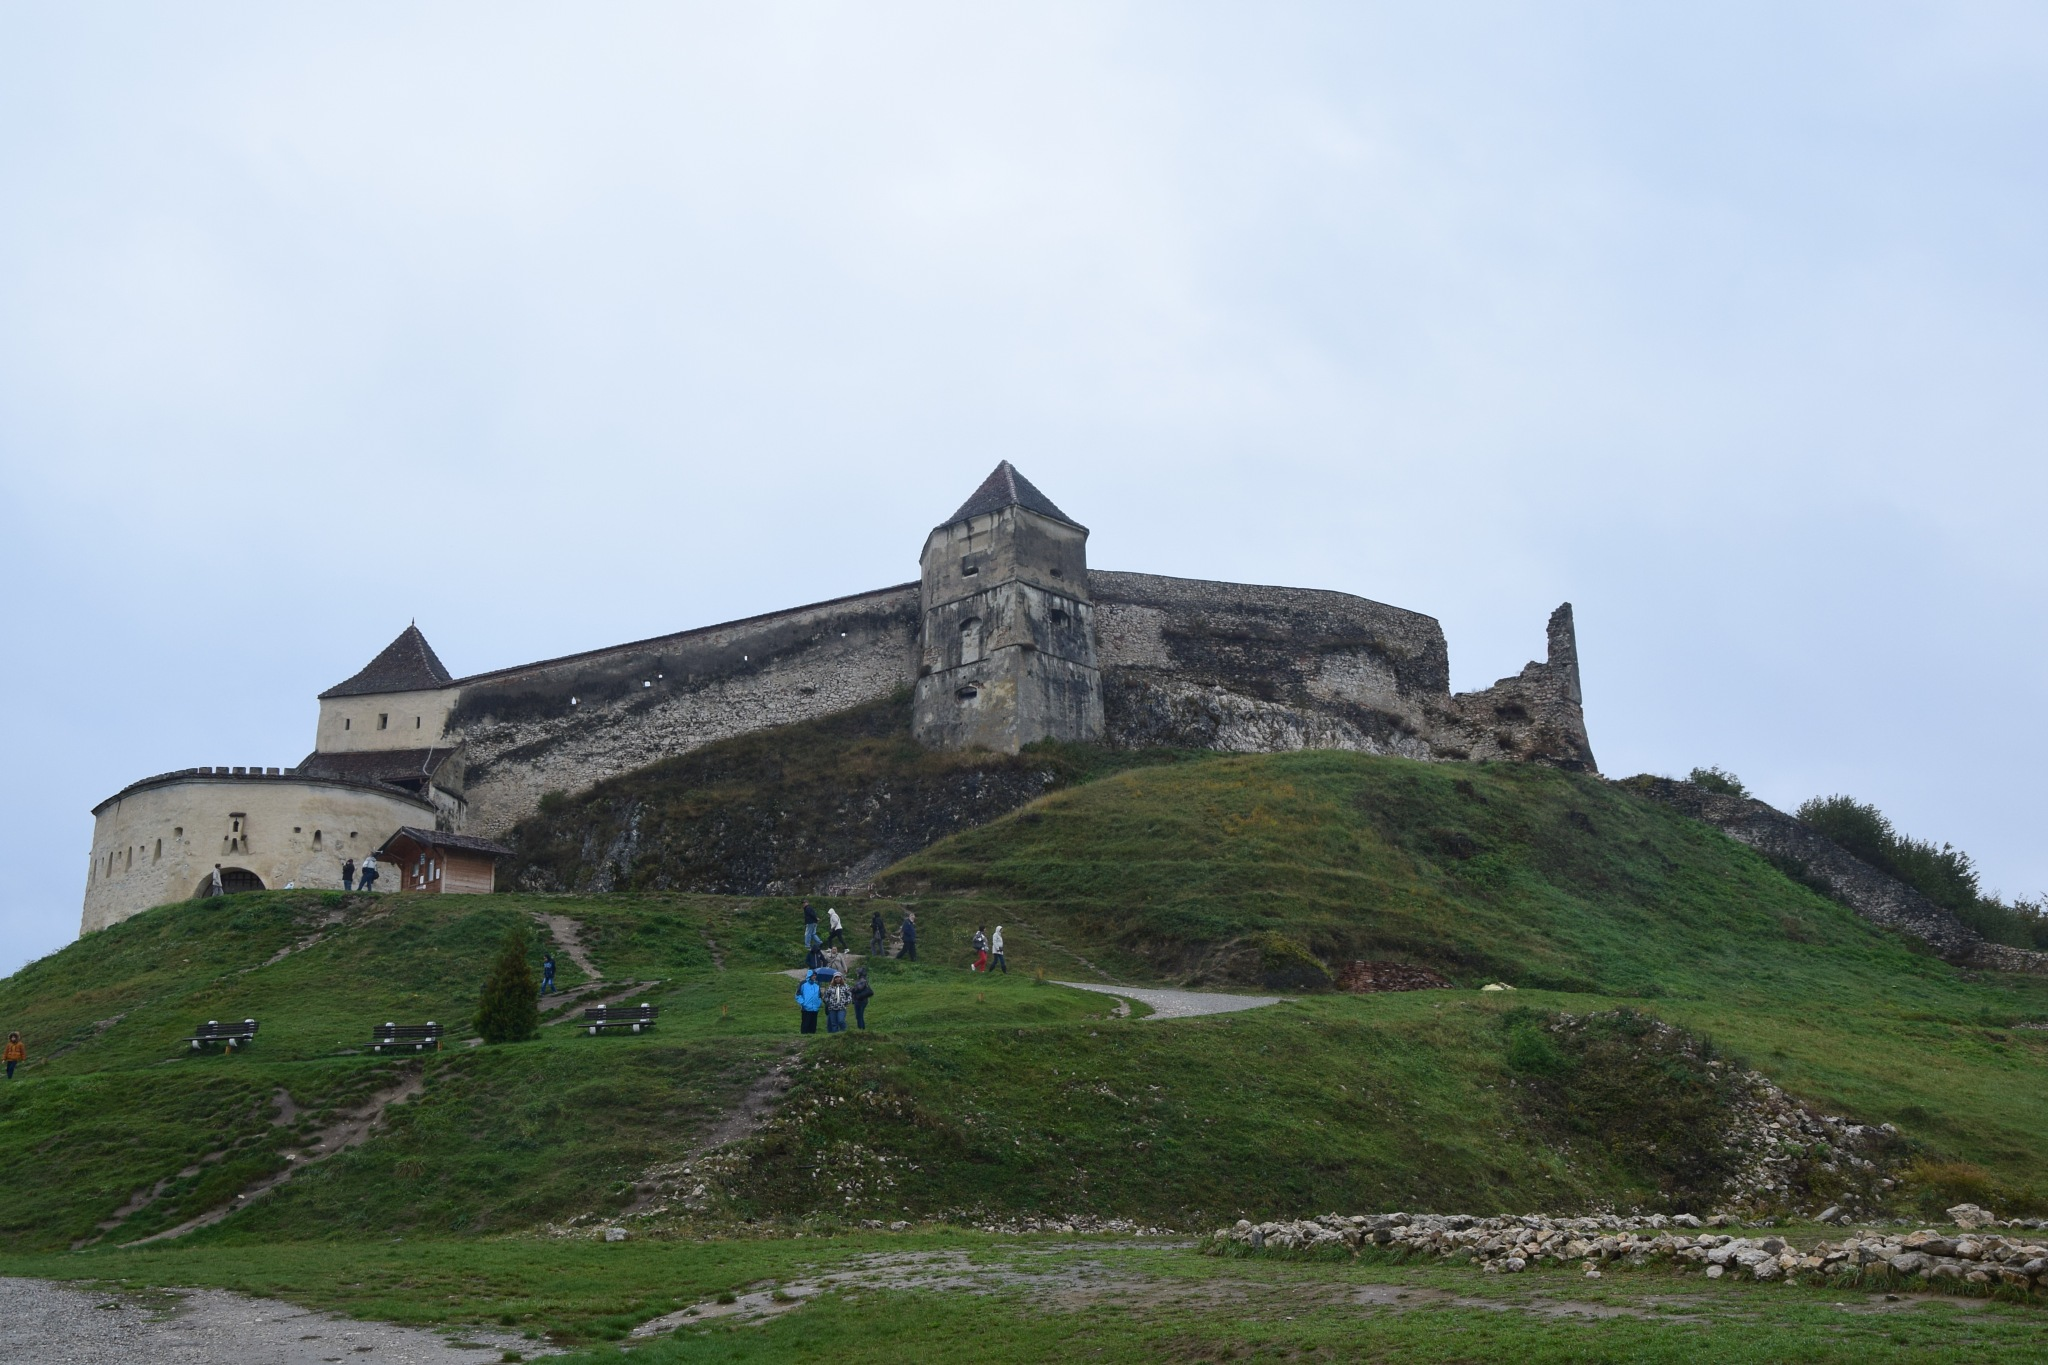 Rasnov Fortress by GraemeLeePollard